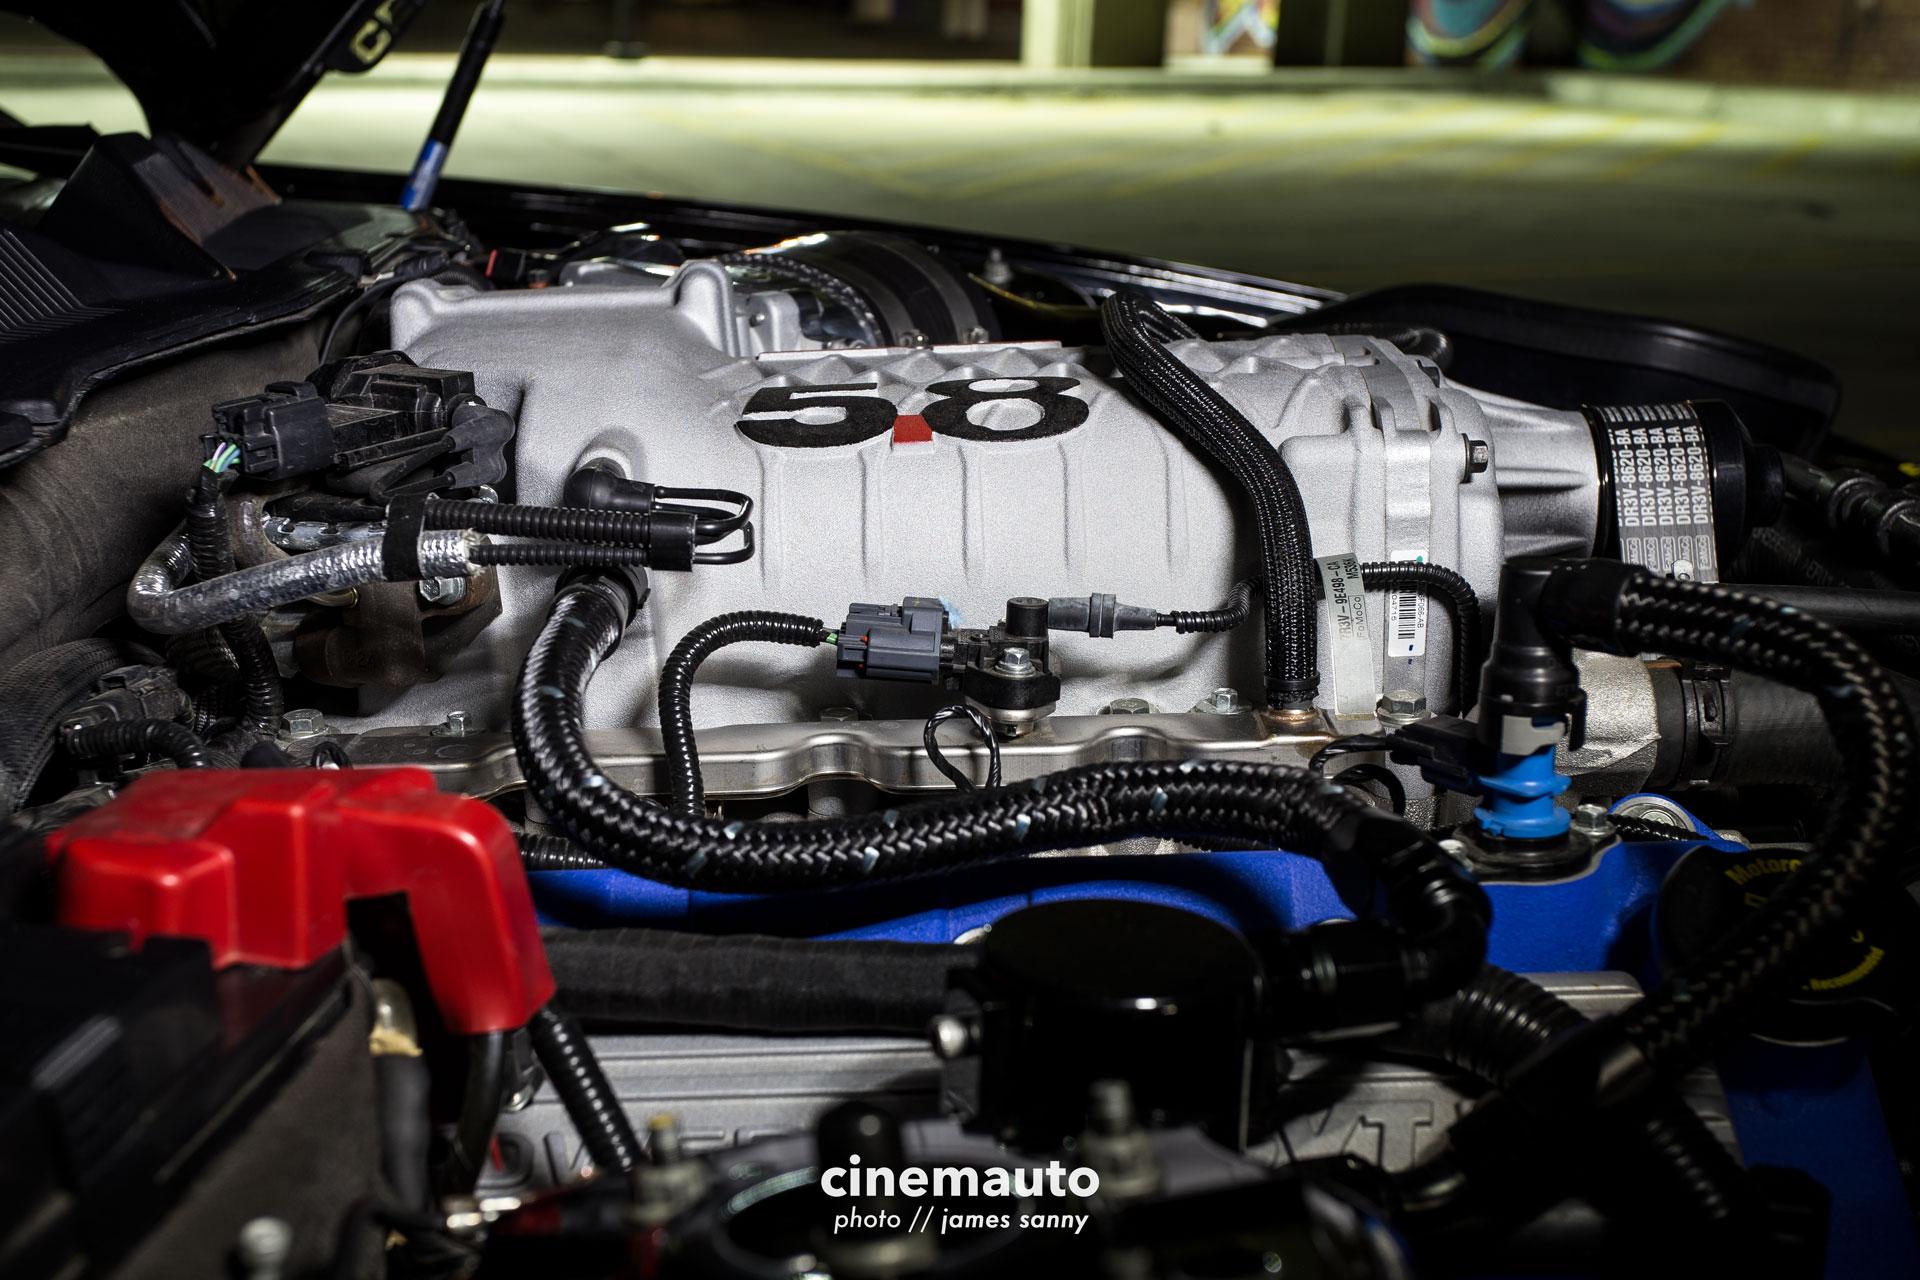 cinemauto-wichita-autmotive-photography-cj23a.jpg